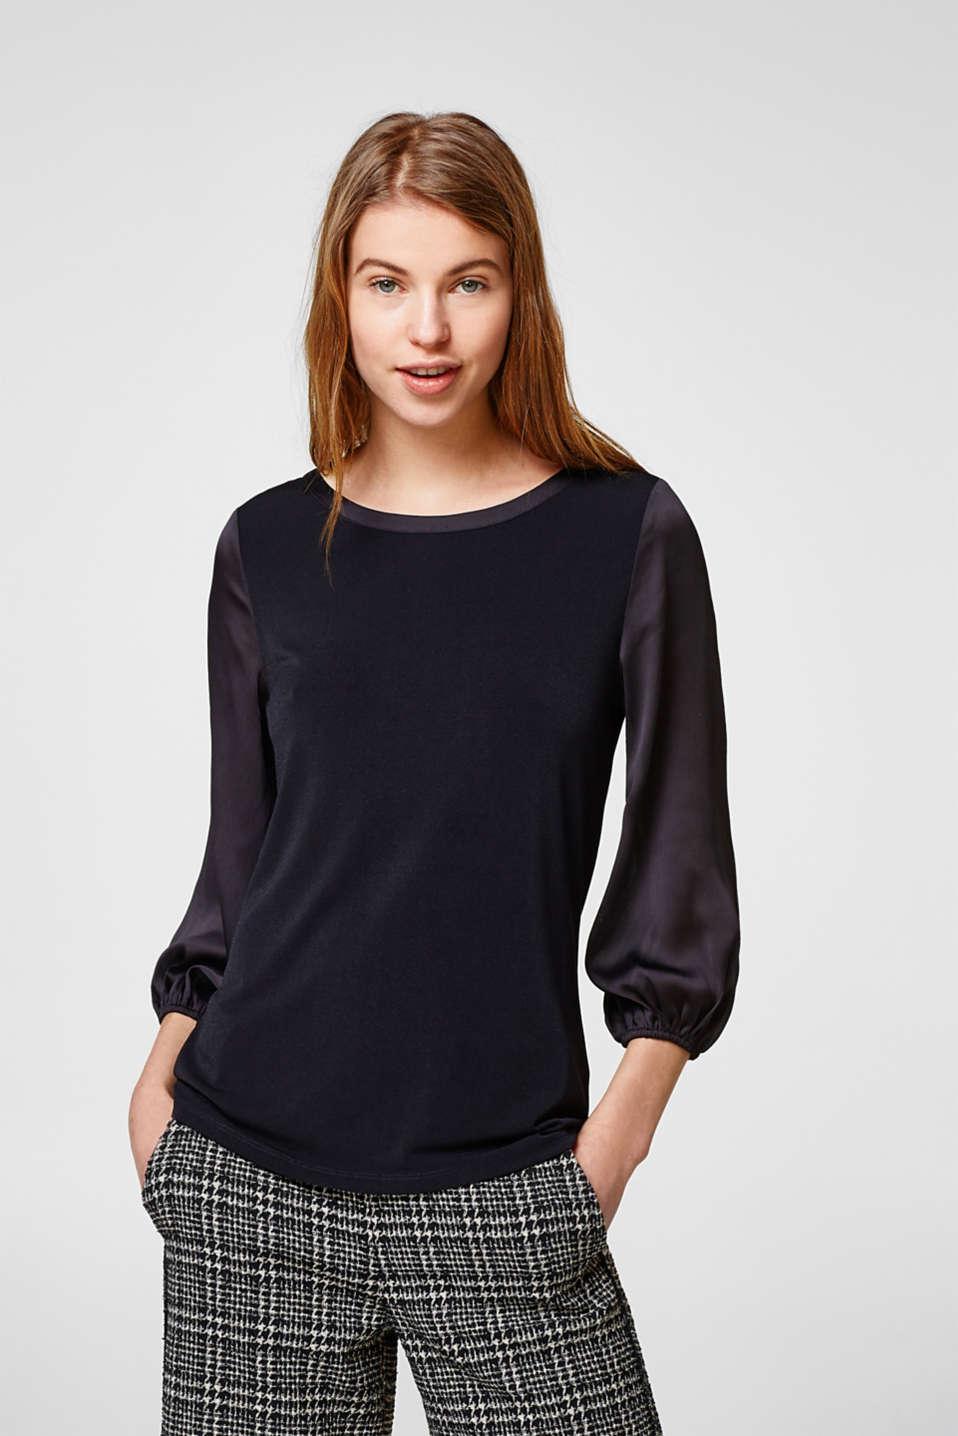 esprit flie endes shirt mit ballon rmeln im online shop kaufen. Black Bedroom Furniture Sets. Home Design Ideas